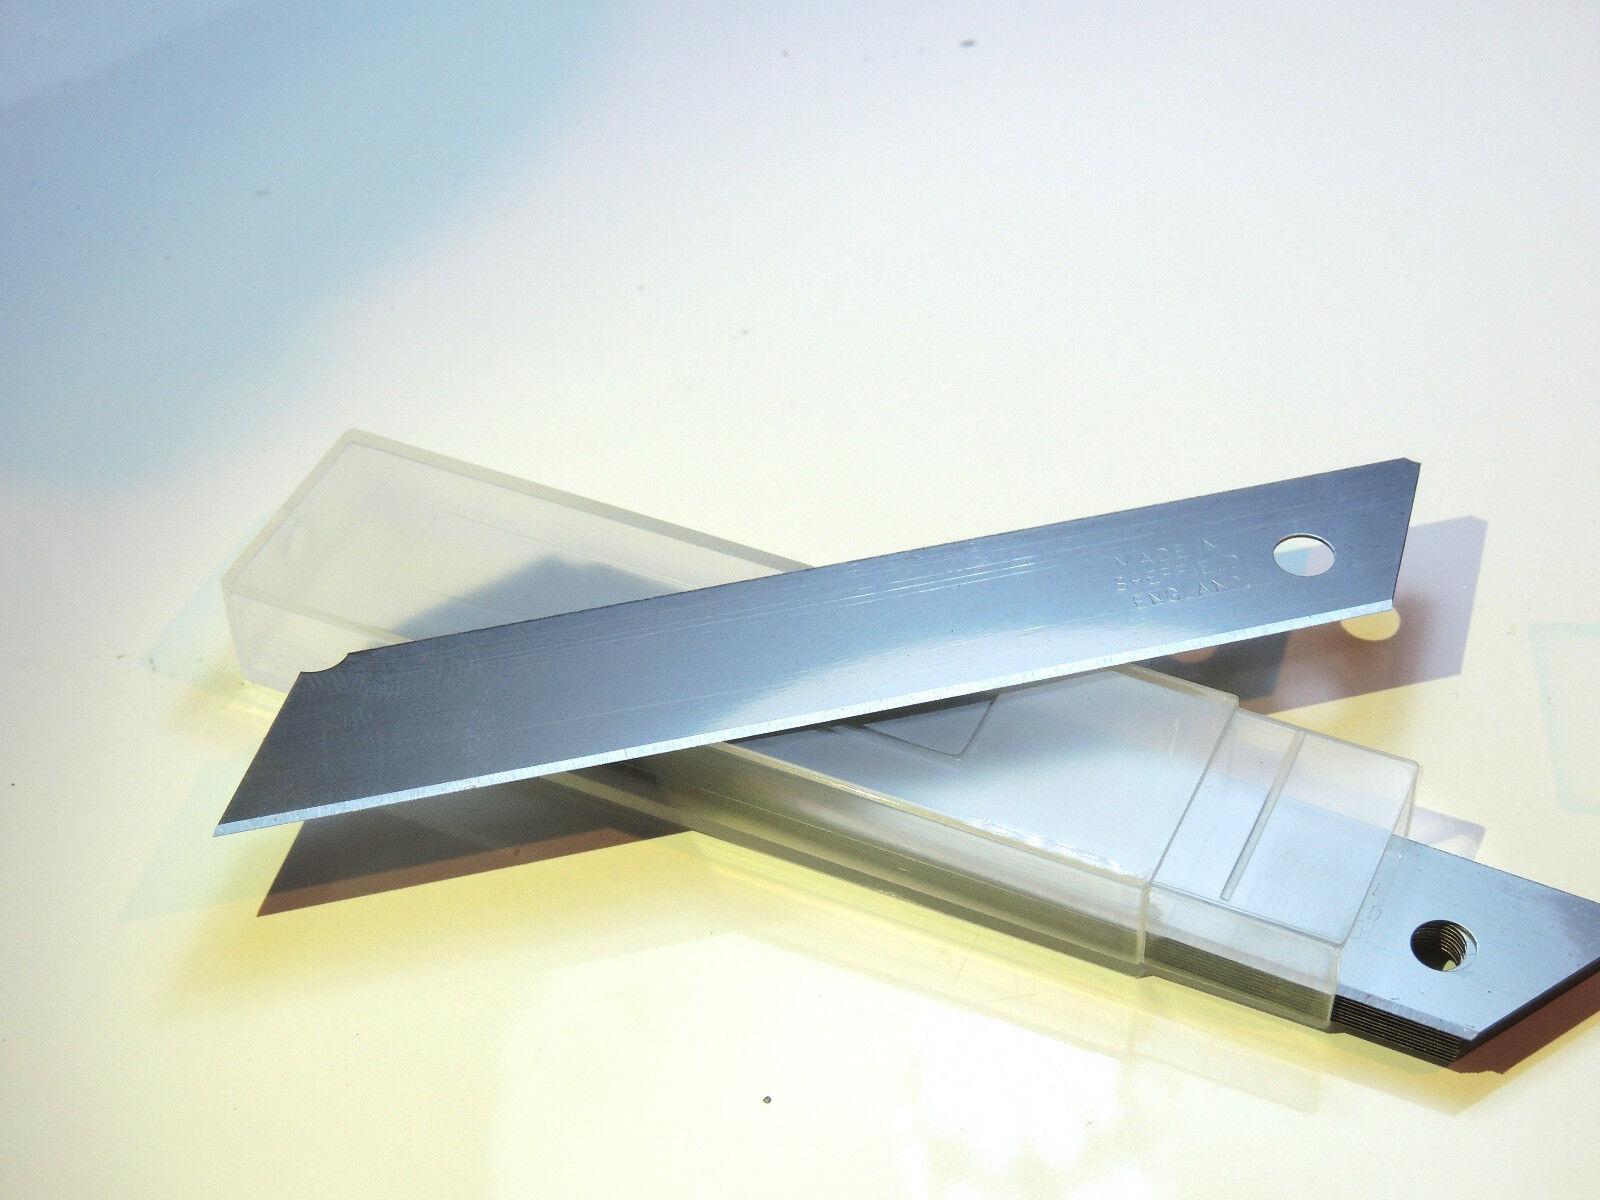 18mm IND203 JEWEL Solid Edge Non Segmented Heavy Duty 0.50mm SHEFFIELD ENGLAND